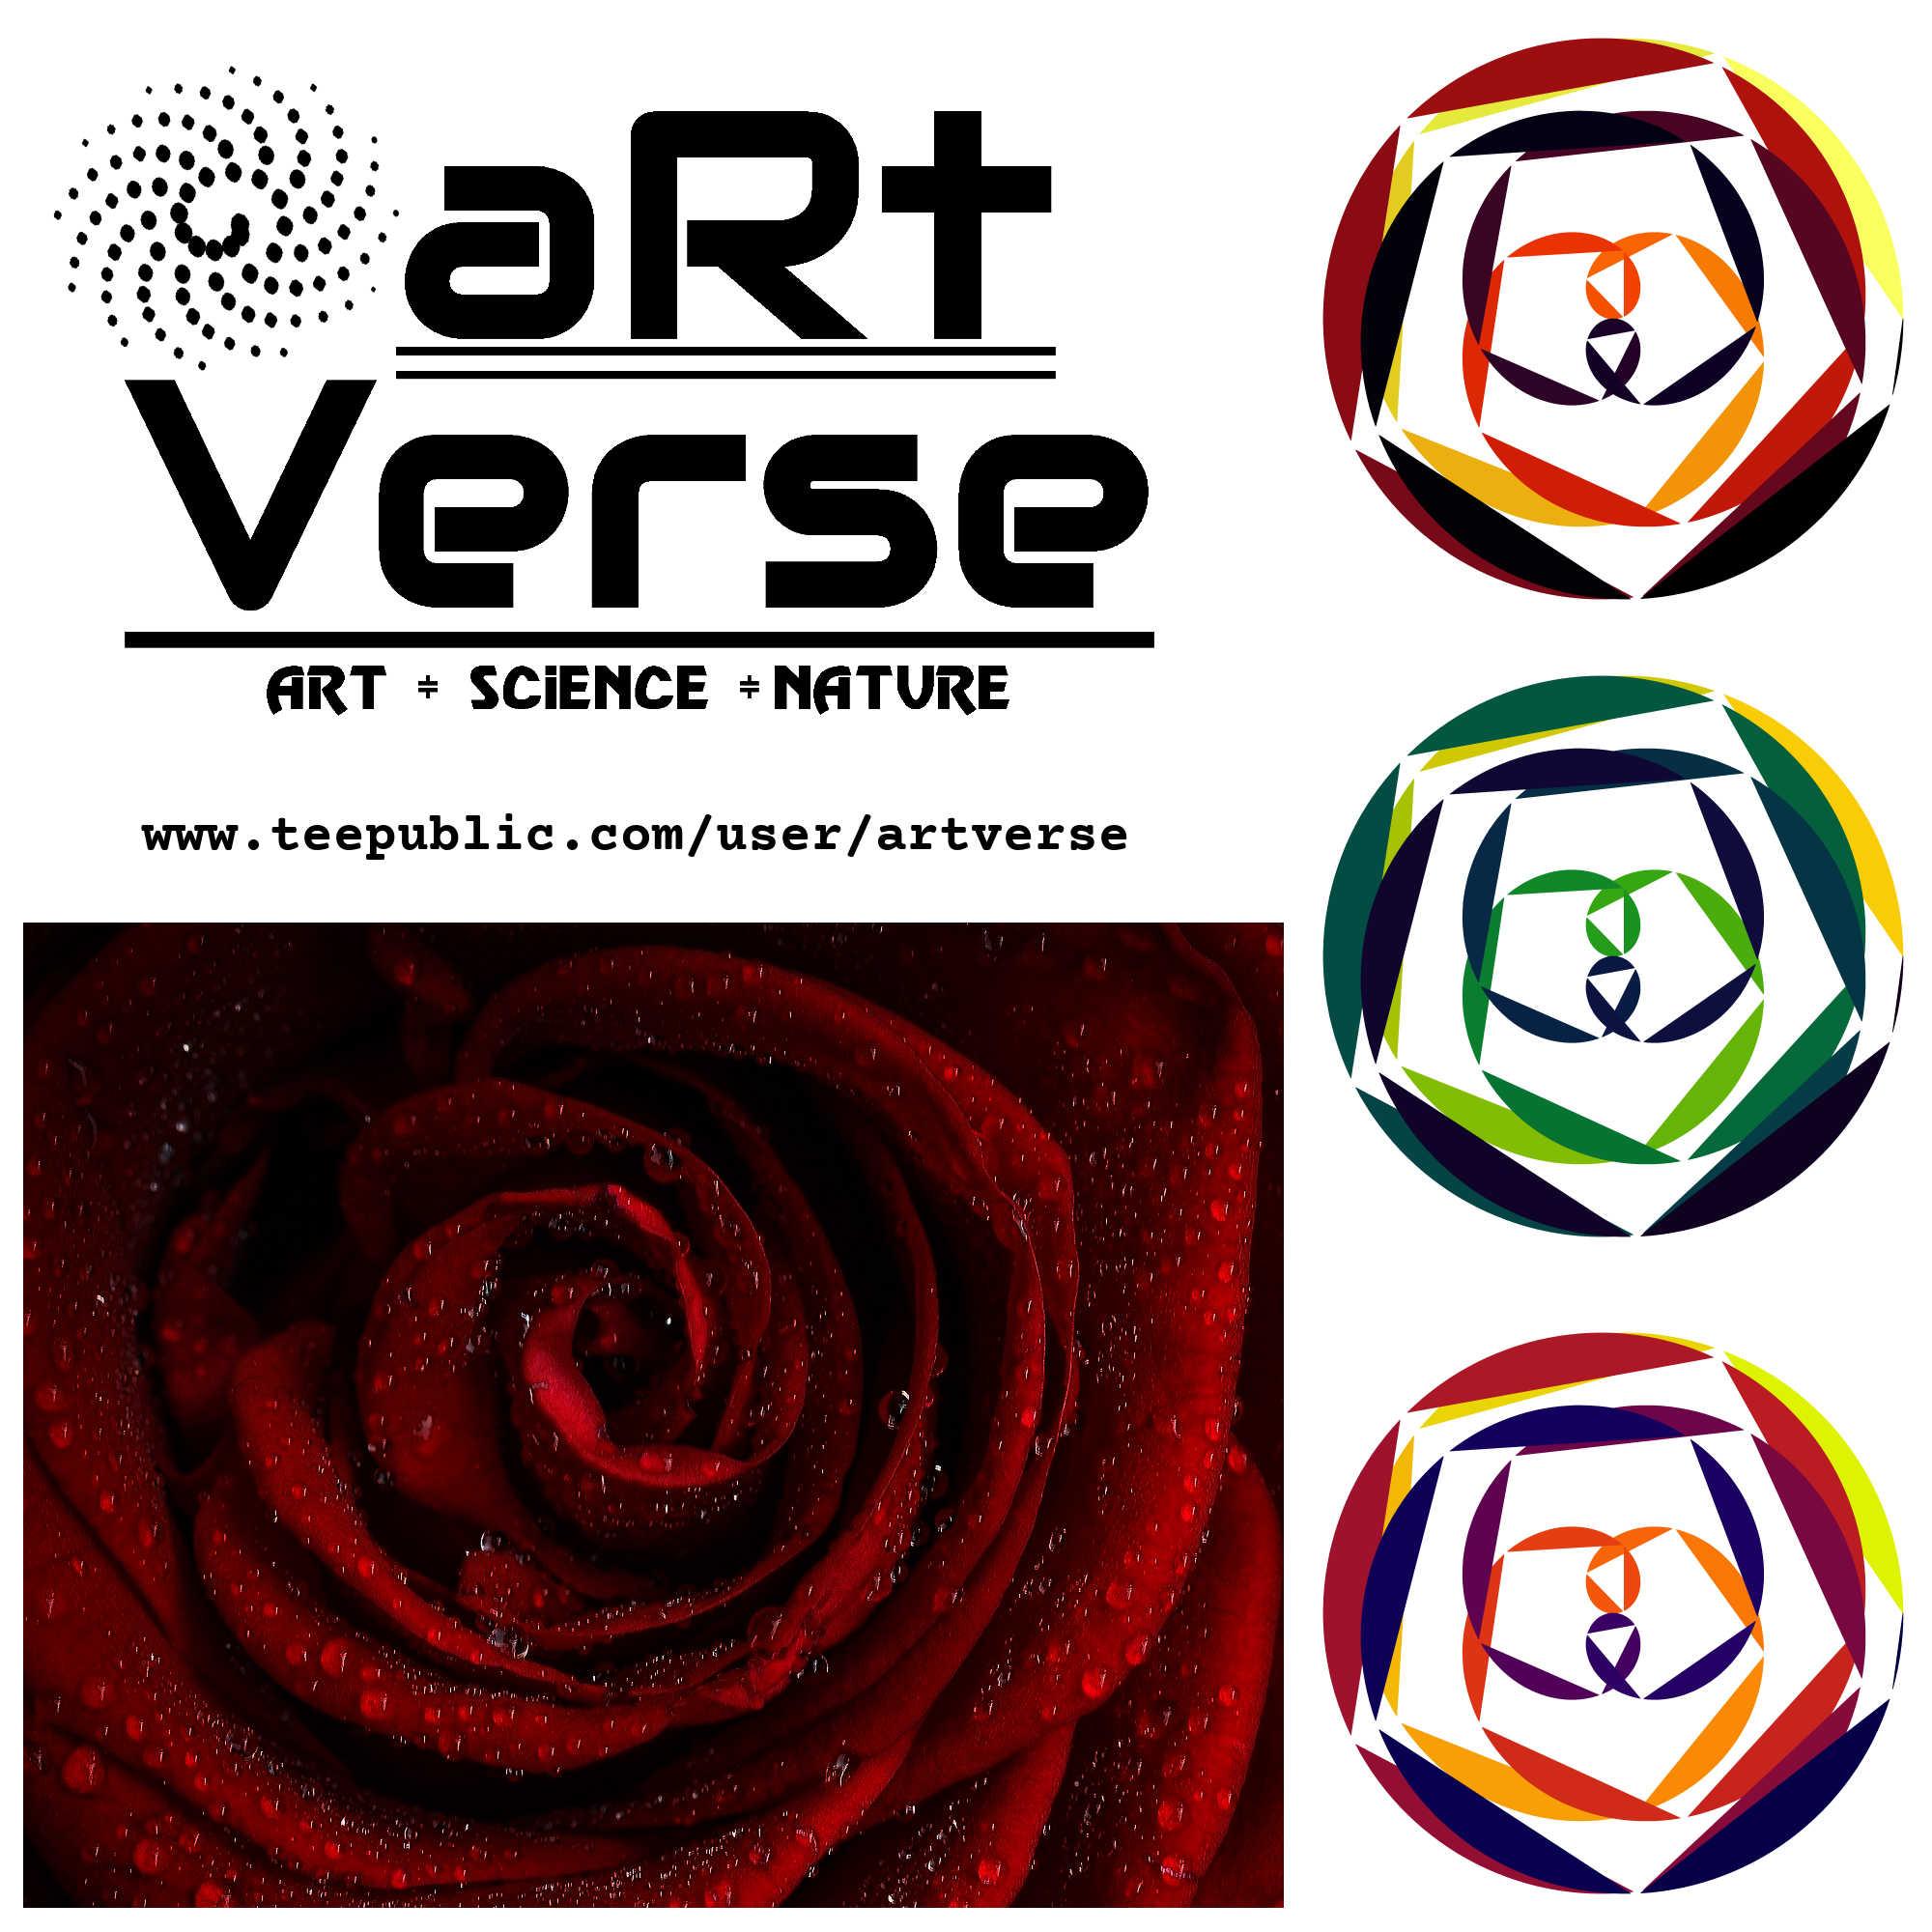 Rose, Rhodonea, Curves, aRtVerse, MindFrameShift, geometry, mathematics, line plots, point plots, polygon plots, data art, code art, algorithmic art, generative art, math art, data science, R programming, teepublic